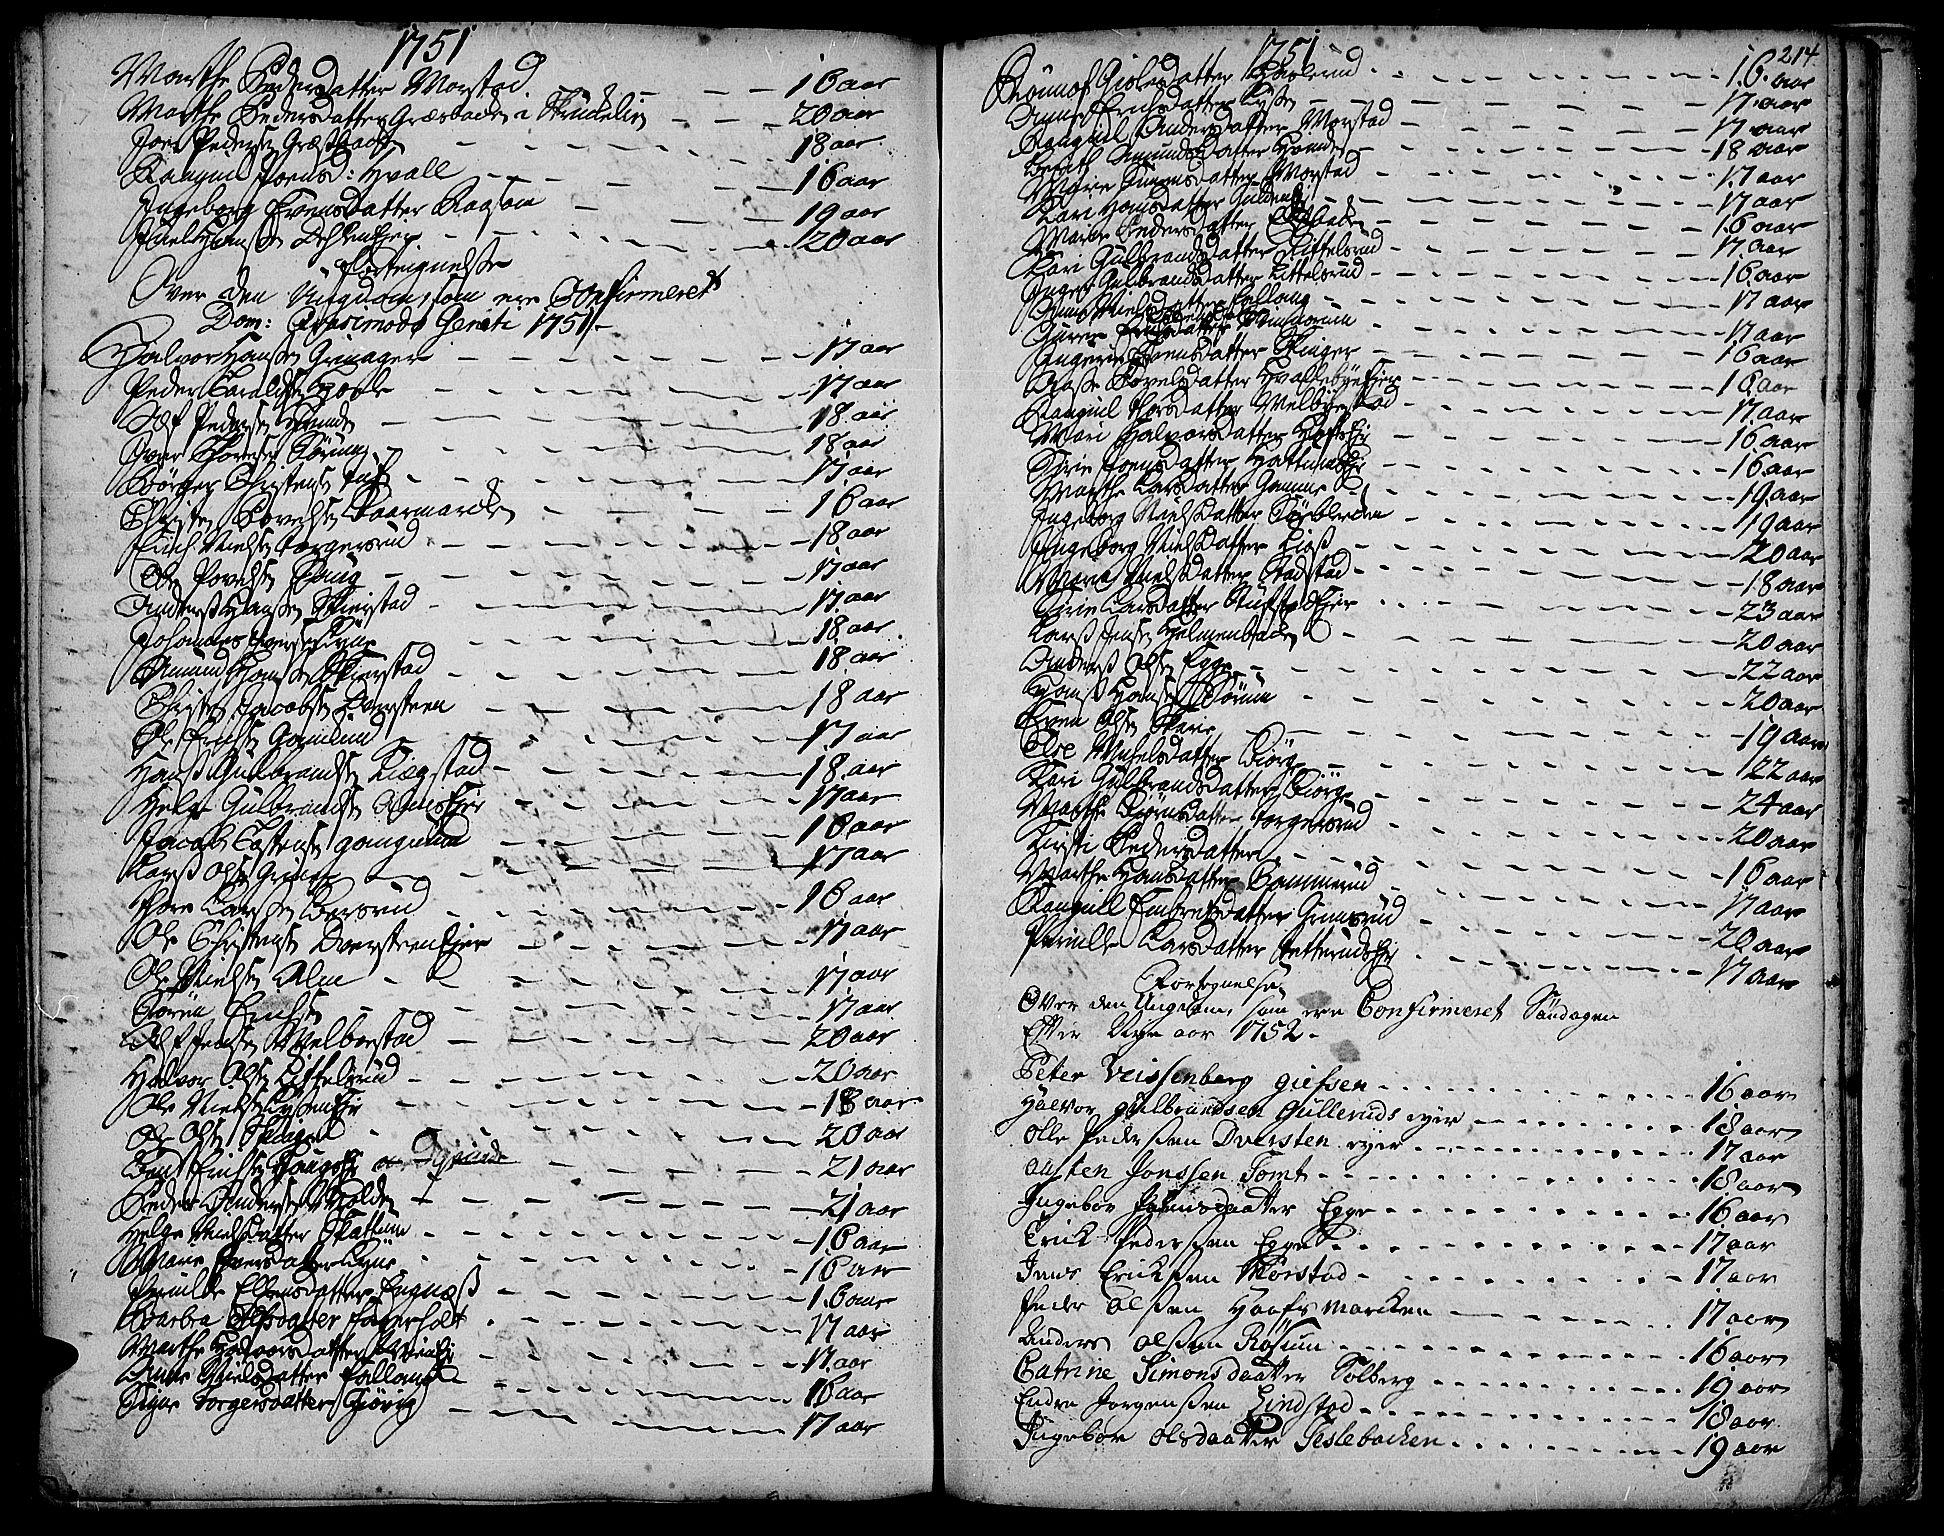 SAH, Gran prestekontor, Ministerialbok nr. 3, 1745-1758, s. 214